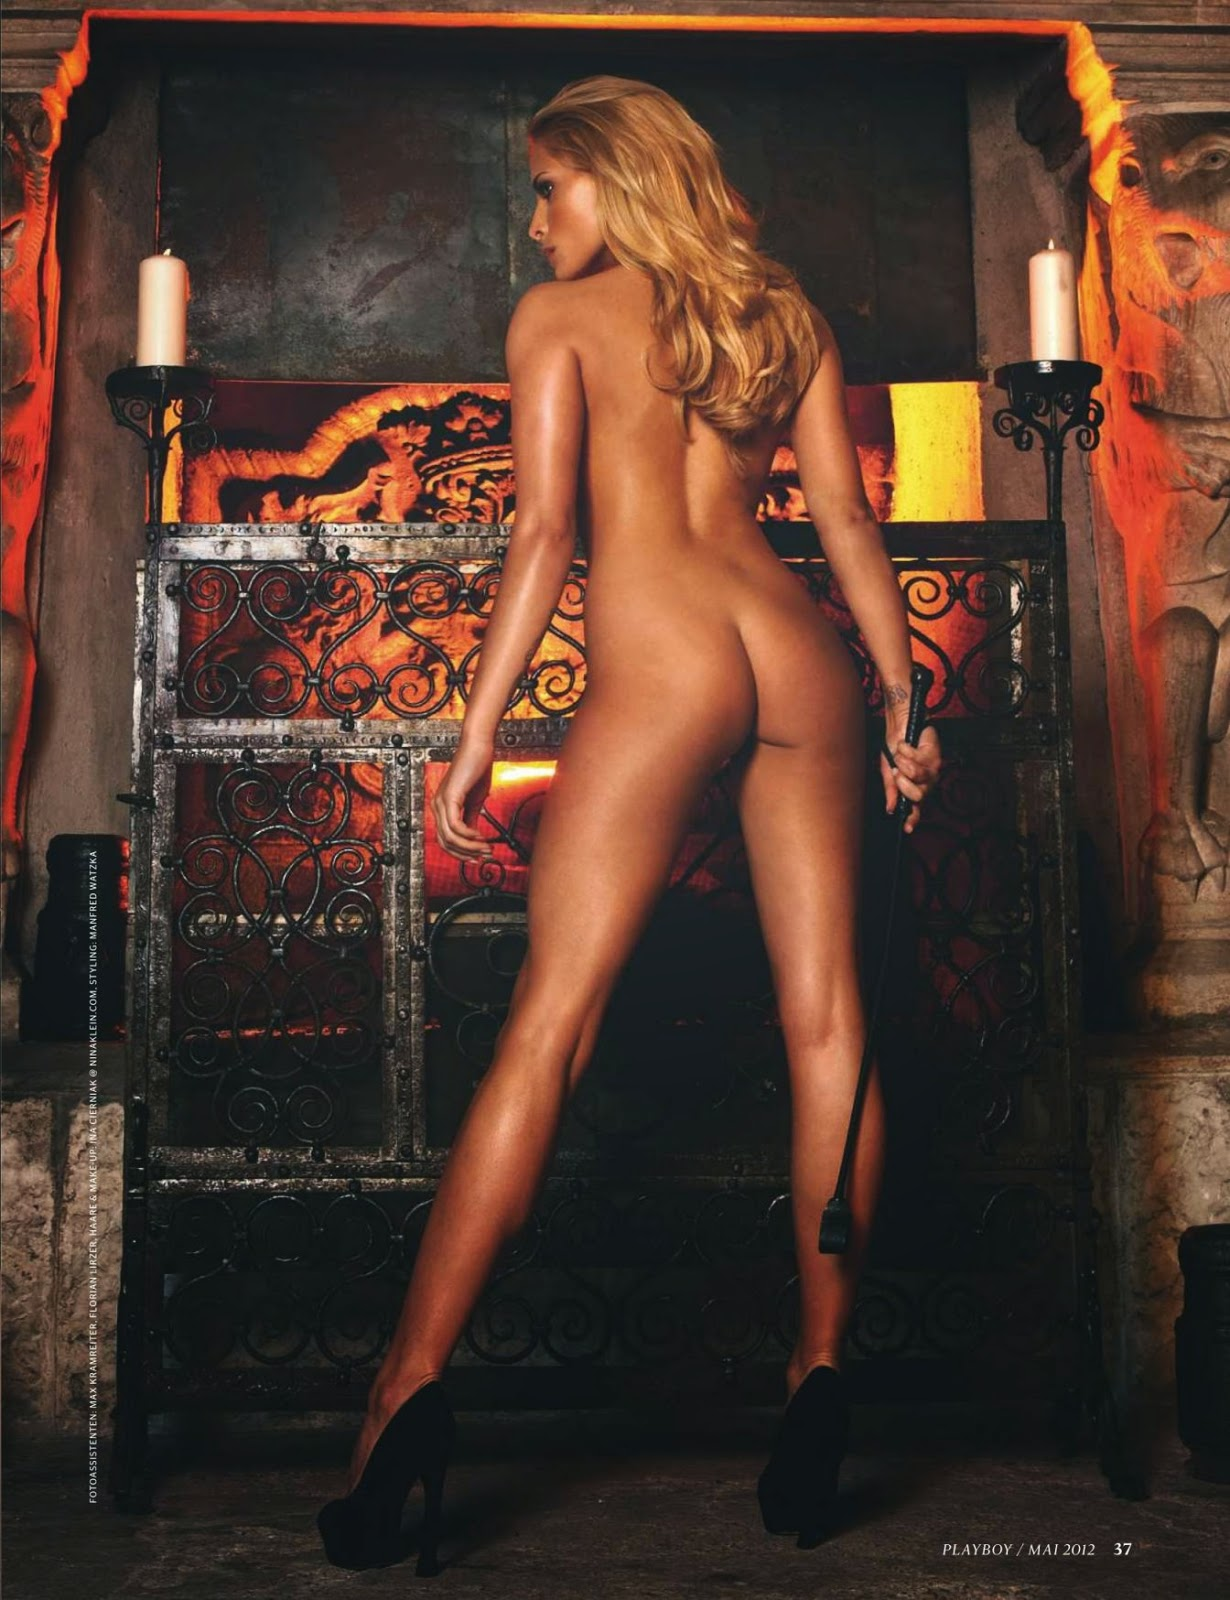 Журнал для взрослых adult: Sophia Thomalla - Playboy ...: ijadult.blogspot.com/2015/04/sophia-thomalla-playboy-may-2015...